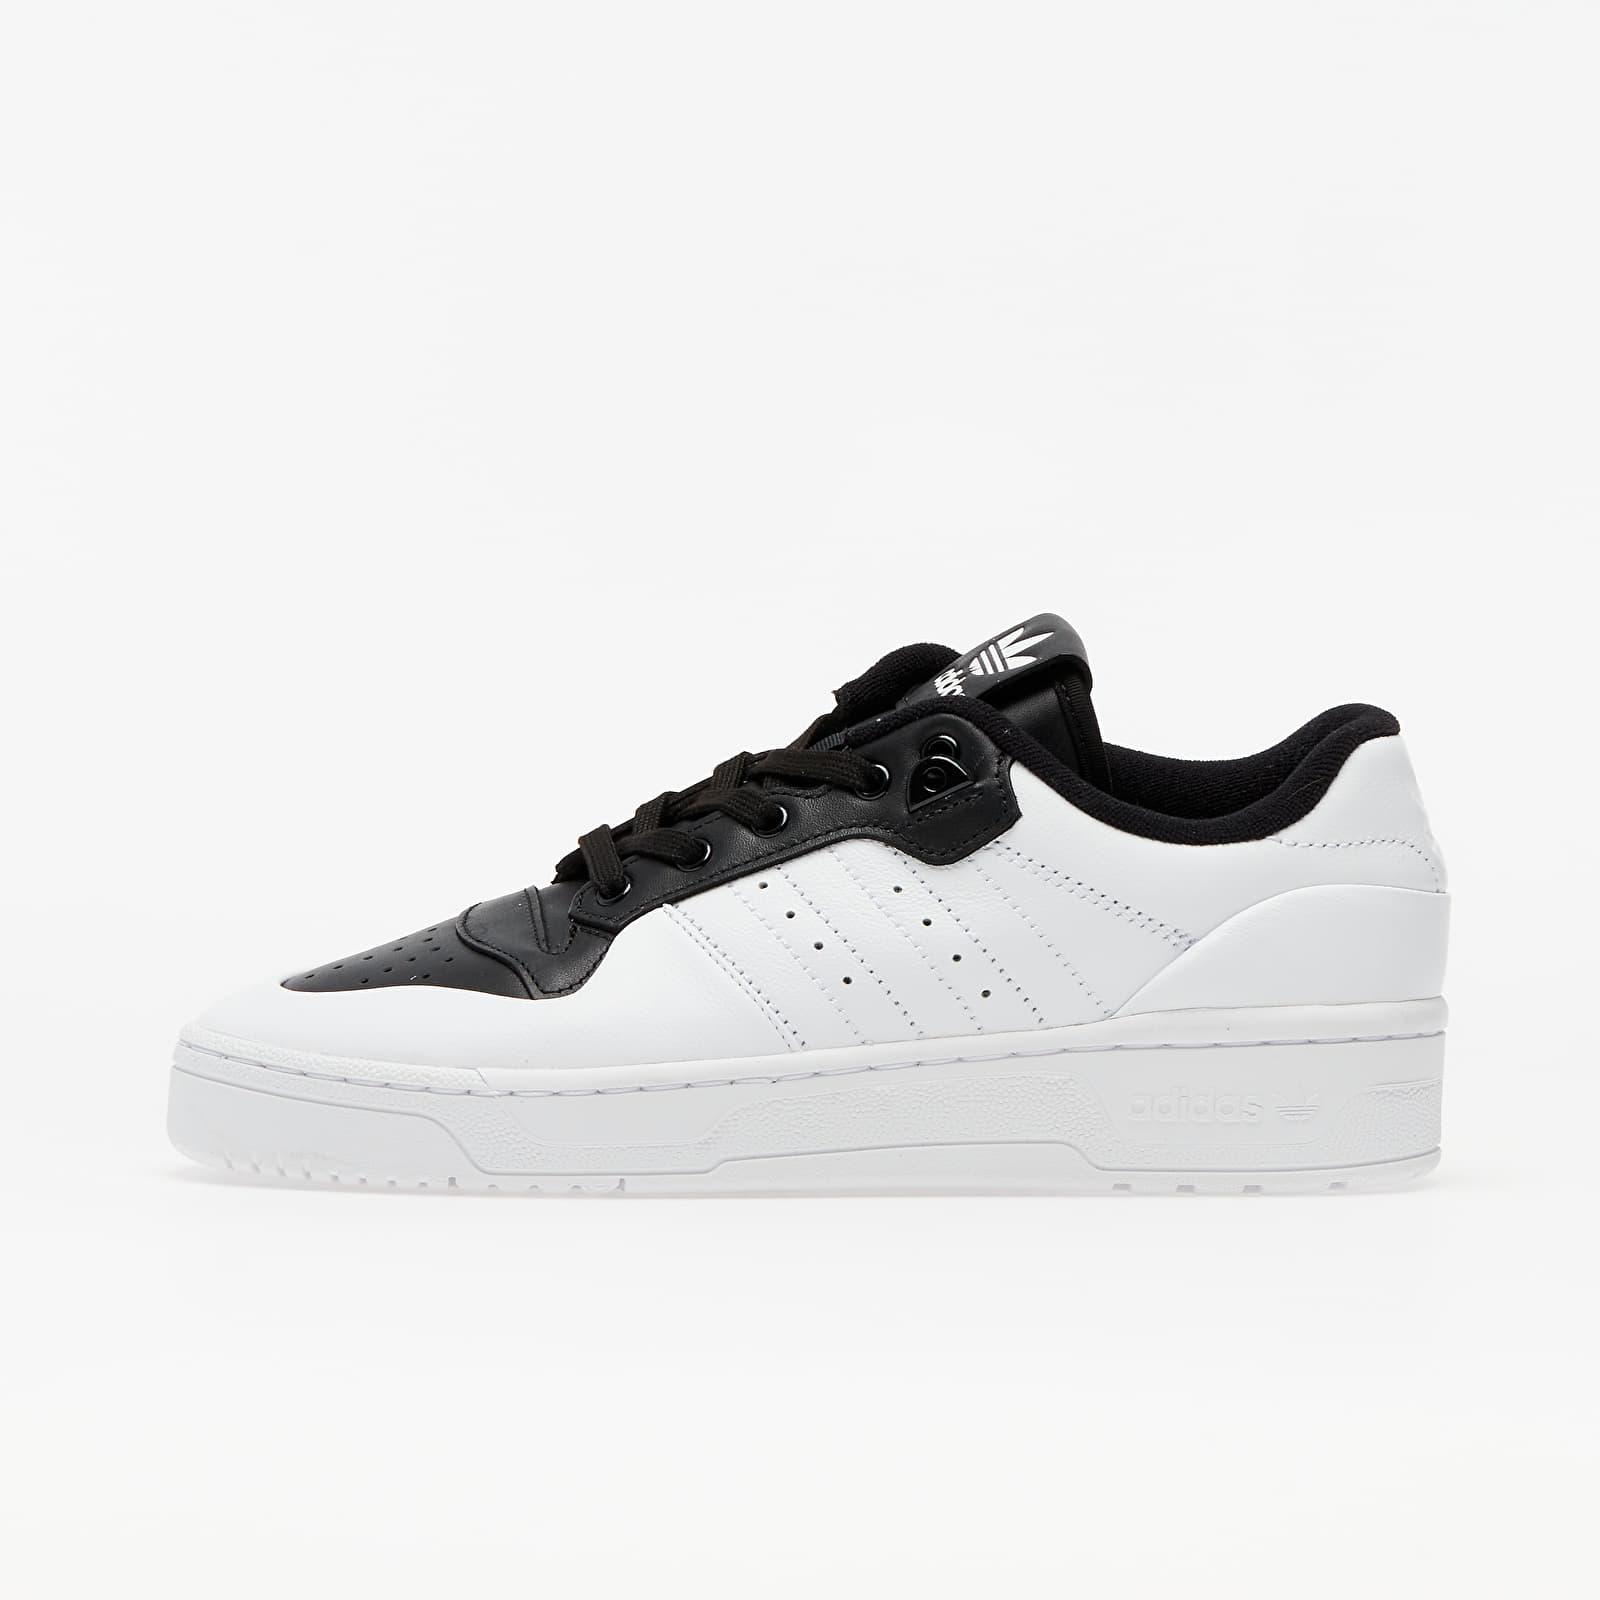 Men's shoes adidas Rivalry Low Ftw White/ Core Black/ Ftw White